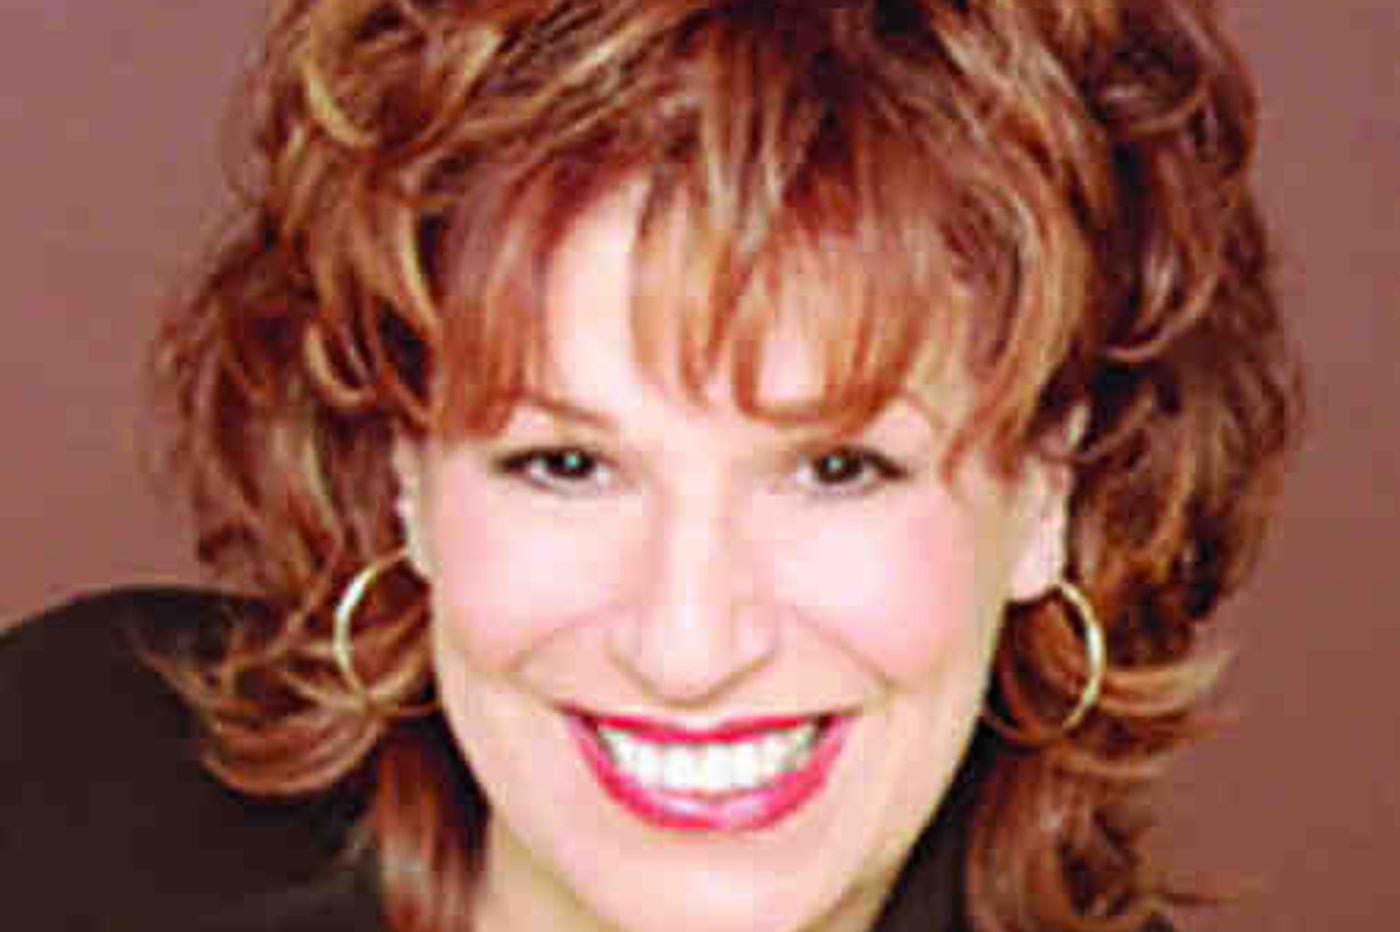 Christine M. Flowers: The mood swing vote